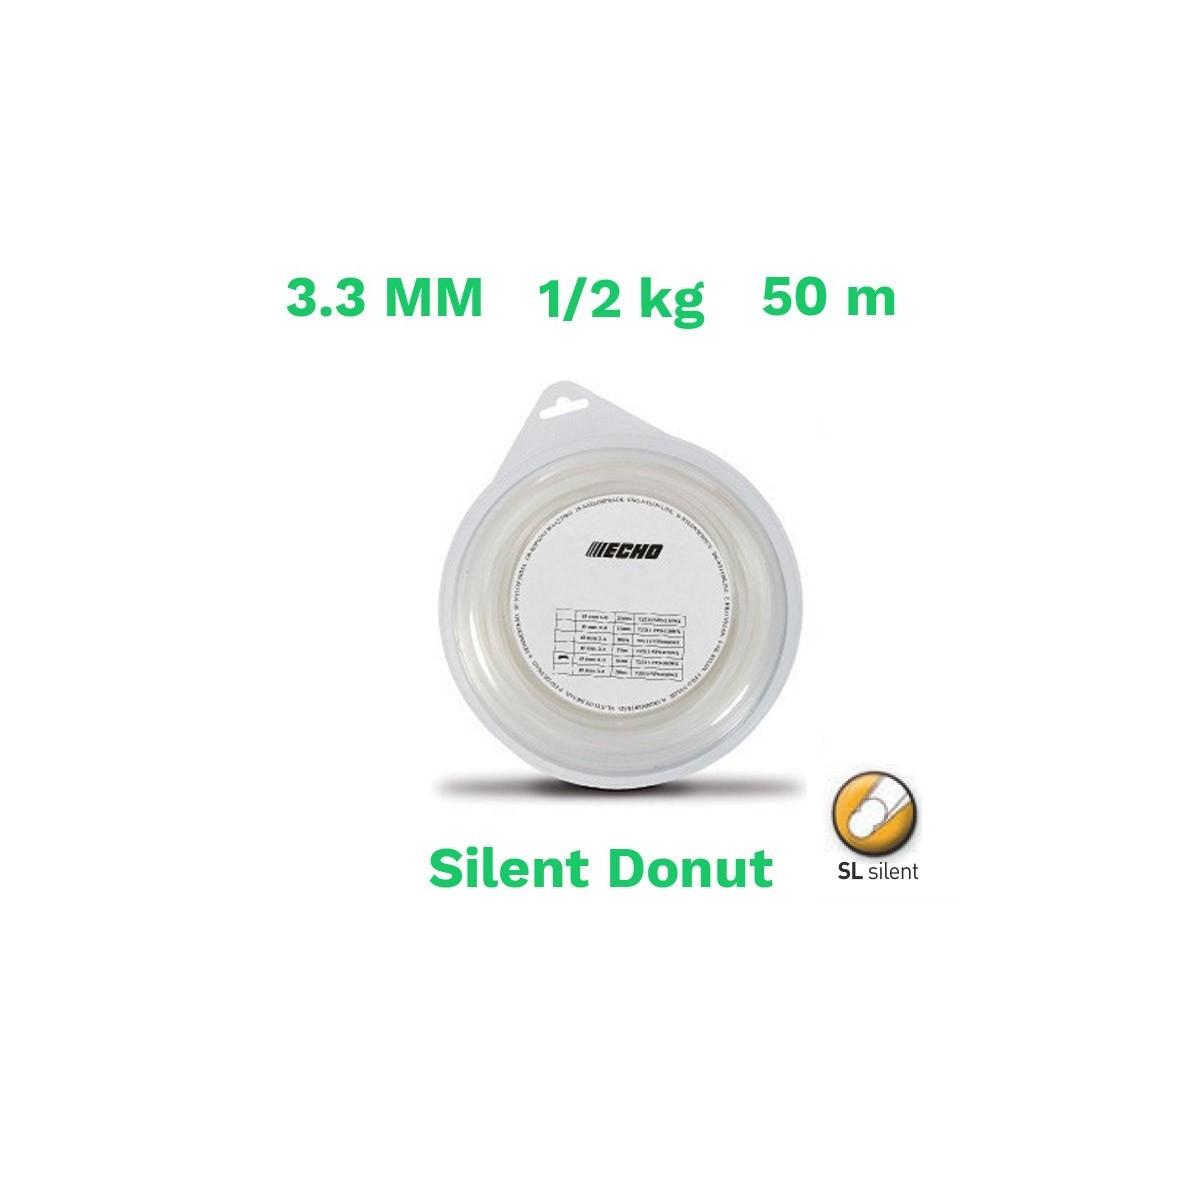 Echo hilo nylon silent donut 3.3mm 1/2 kg 50 m